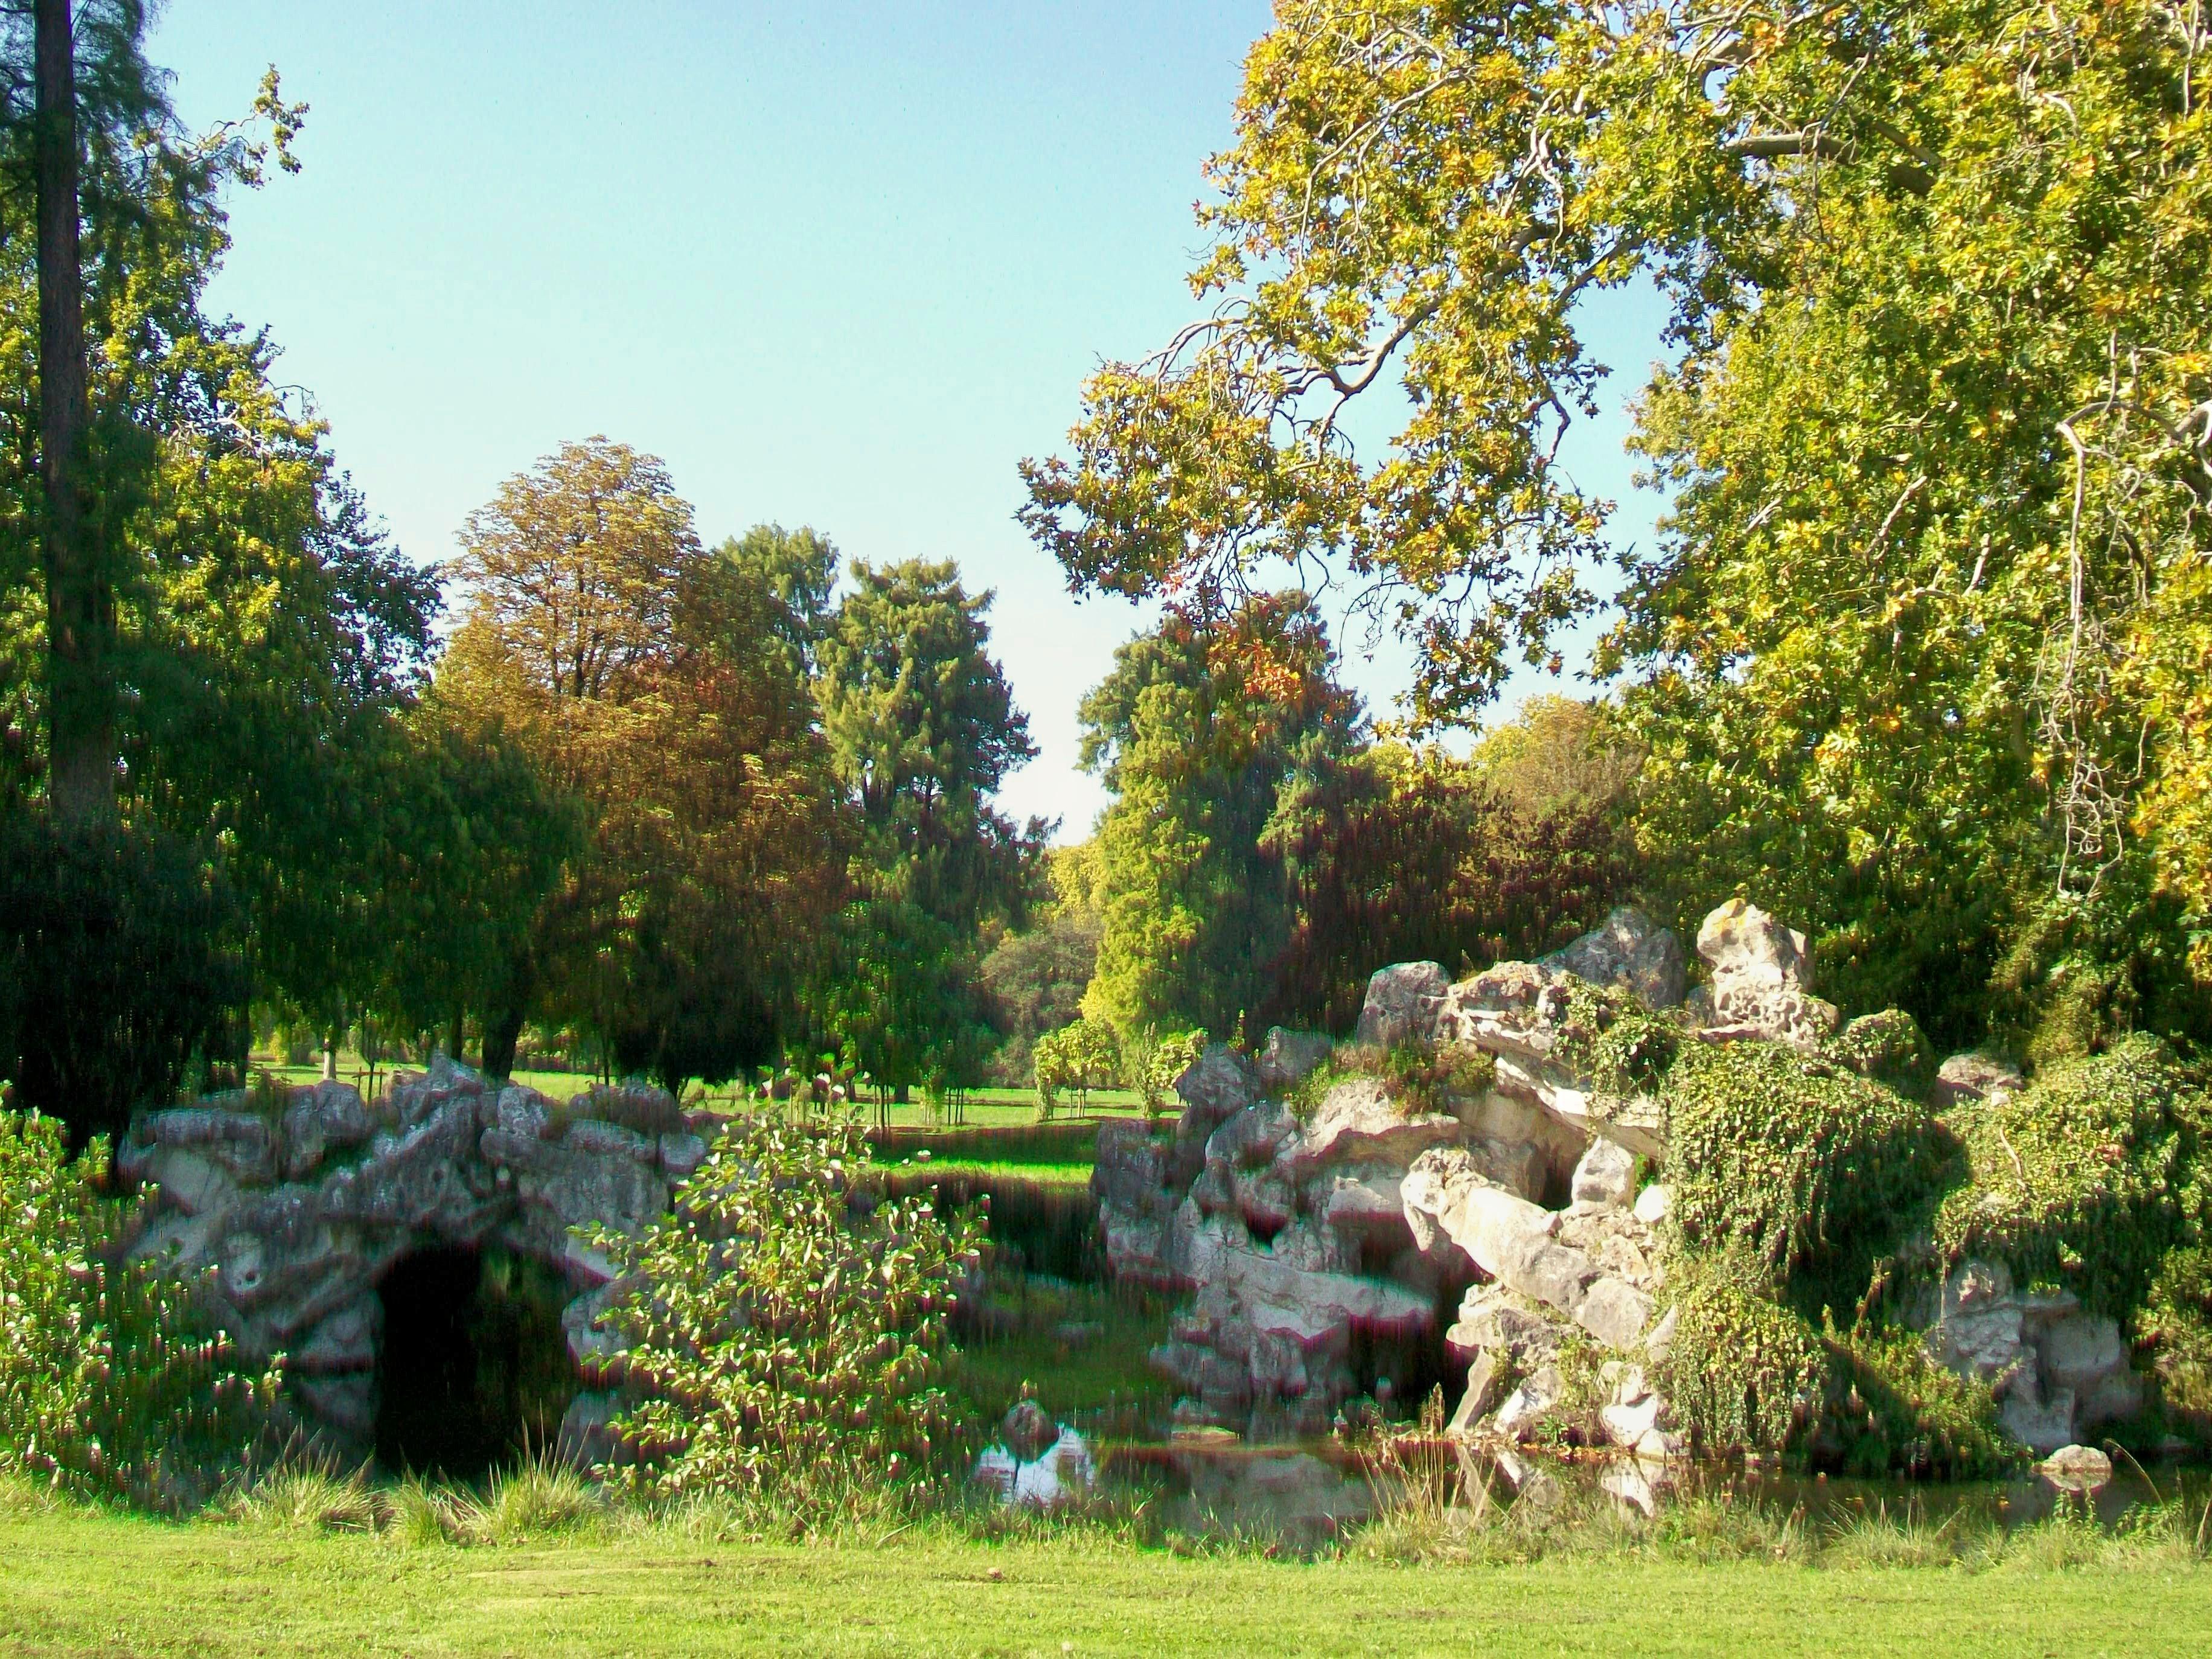 D coration pont de jardin original lyon 1311 el for Jardin original